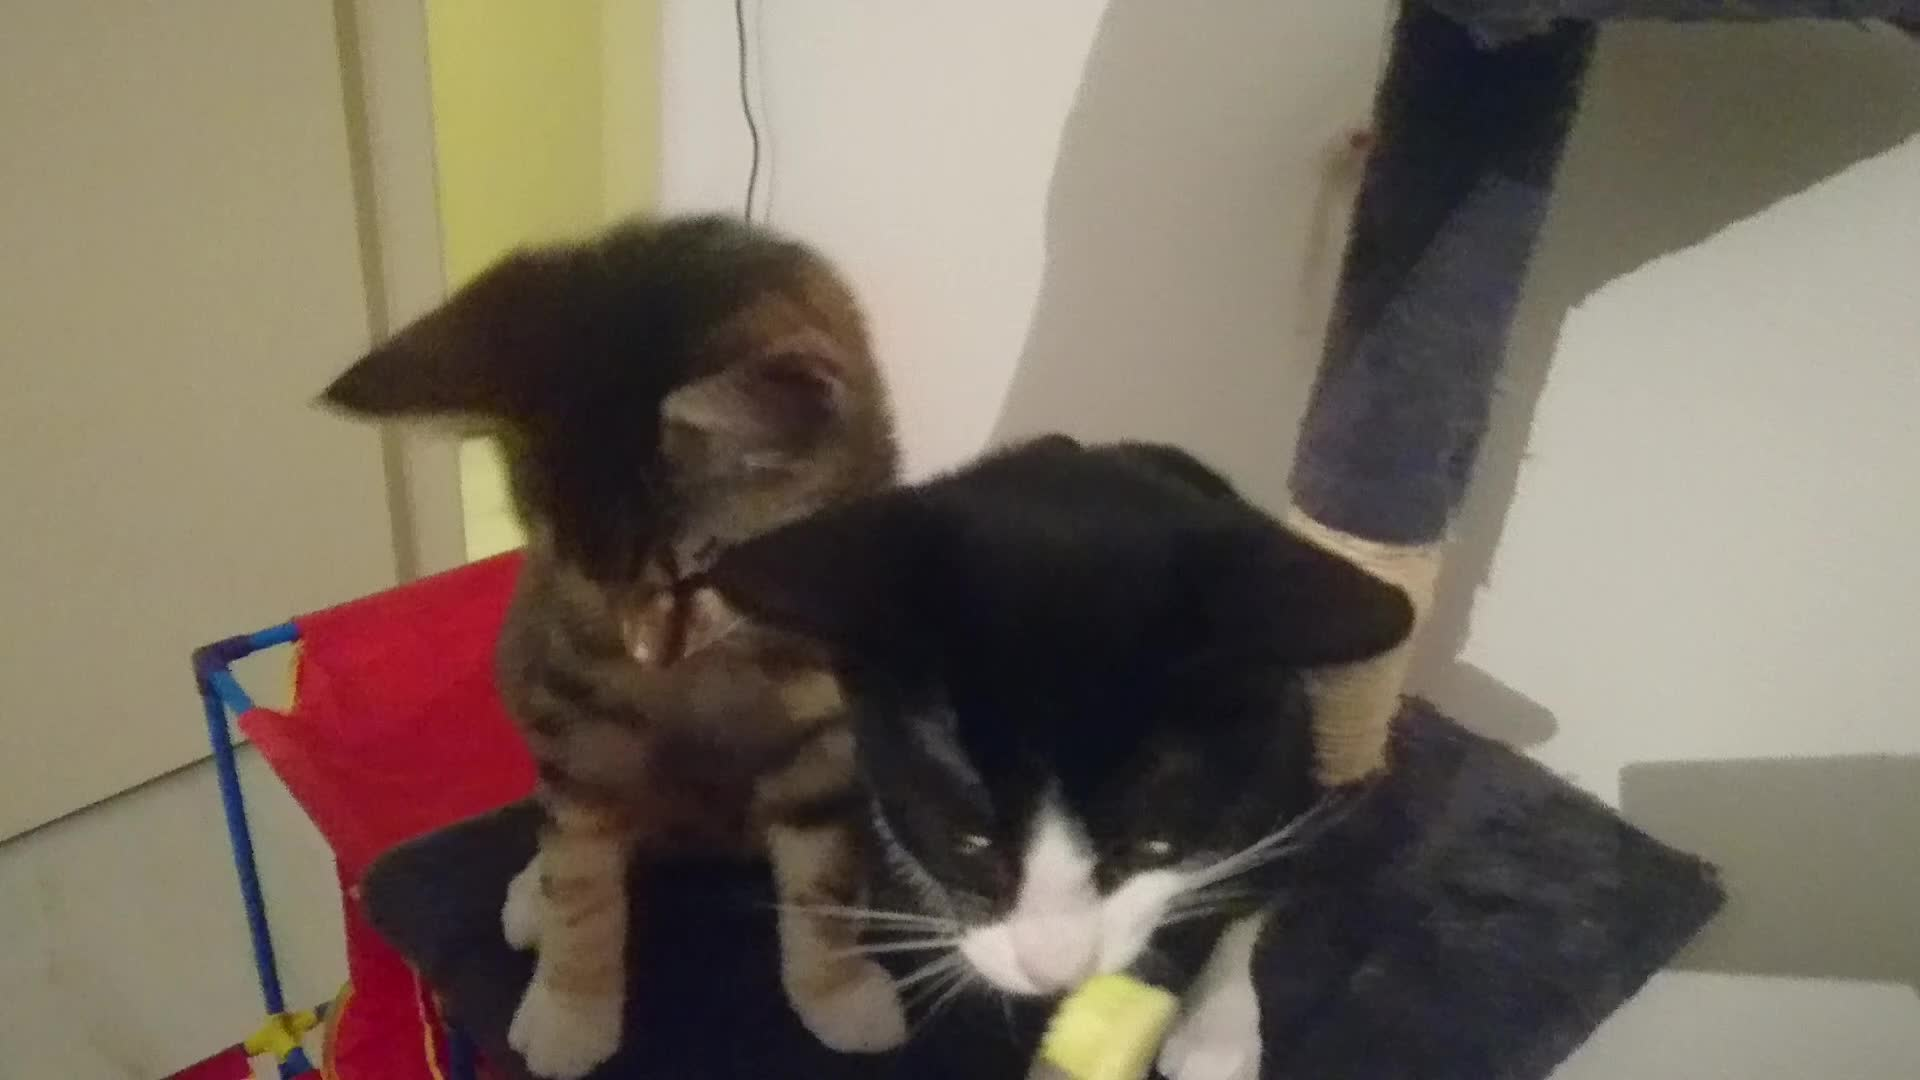 brushy brushy, cat, cats, cute and funny, kitten, kittens, tuxedo cat, Kitten teeth brushy brushy GIFs